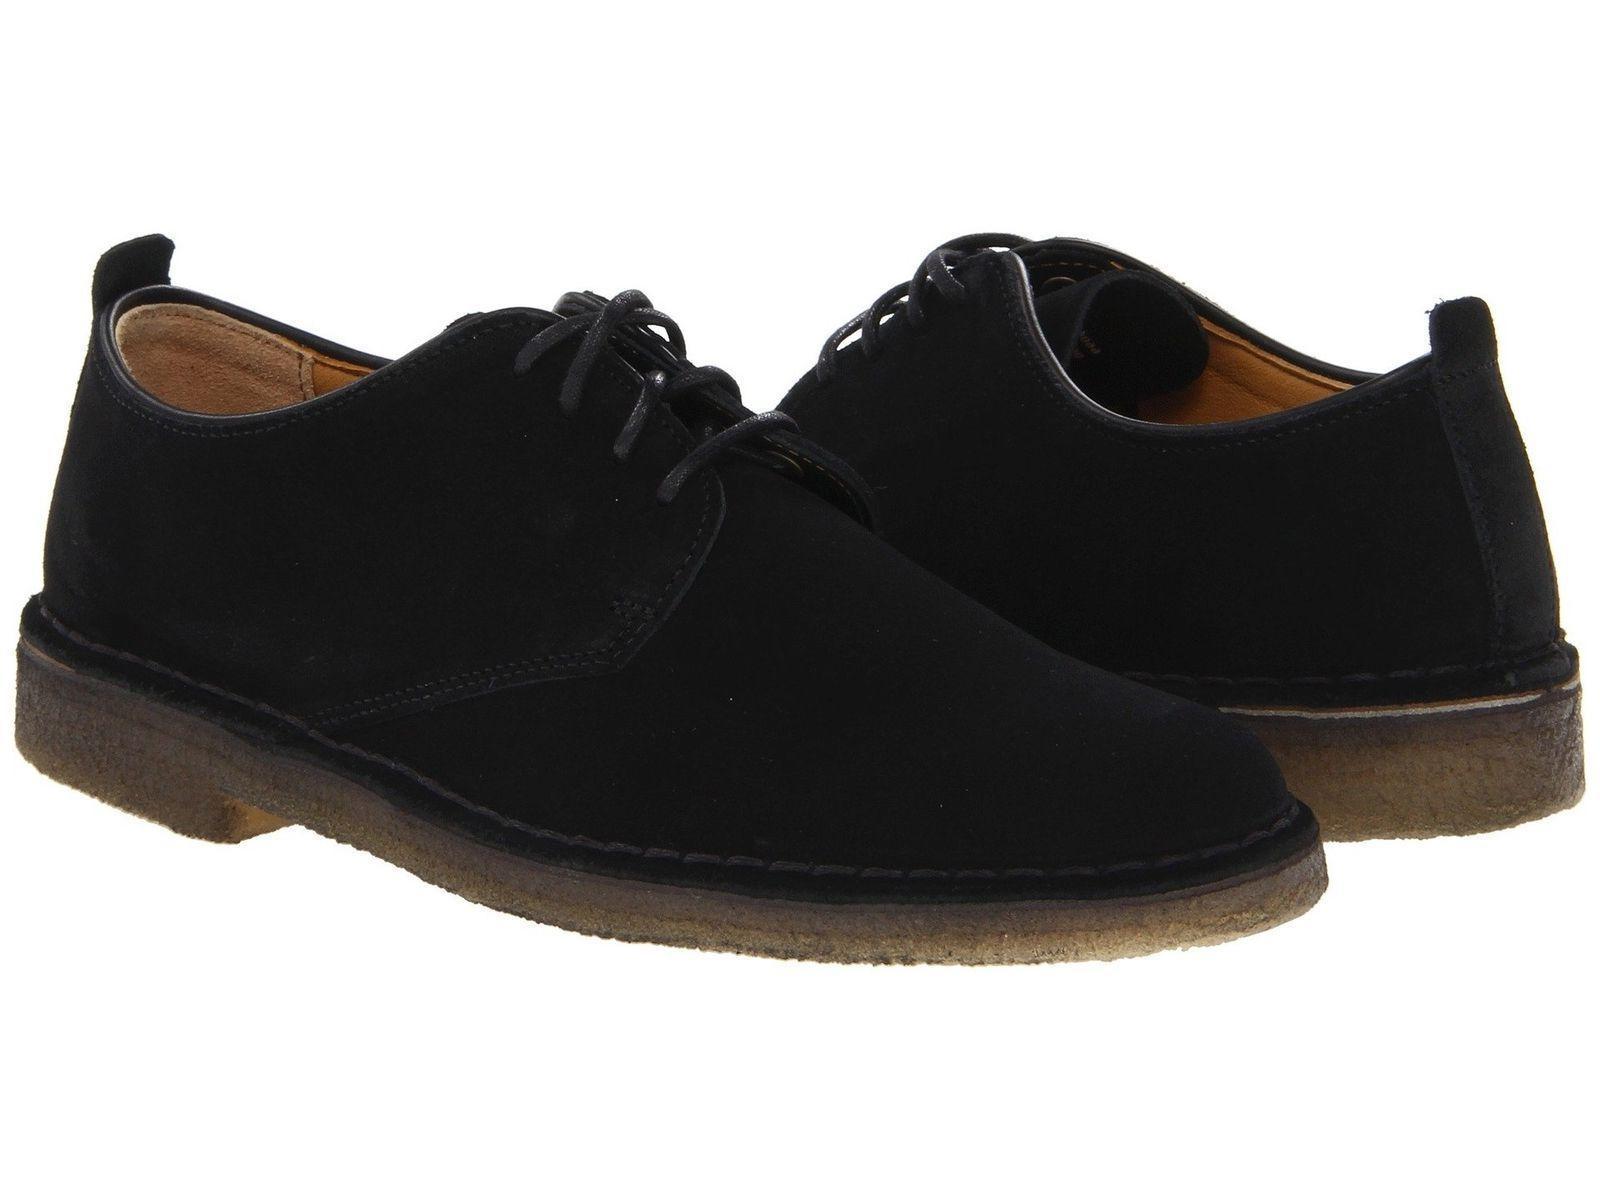 Clarks Originals Desert London Black Shoes